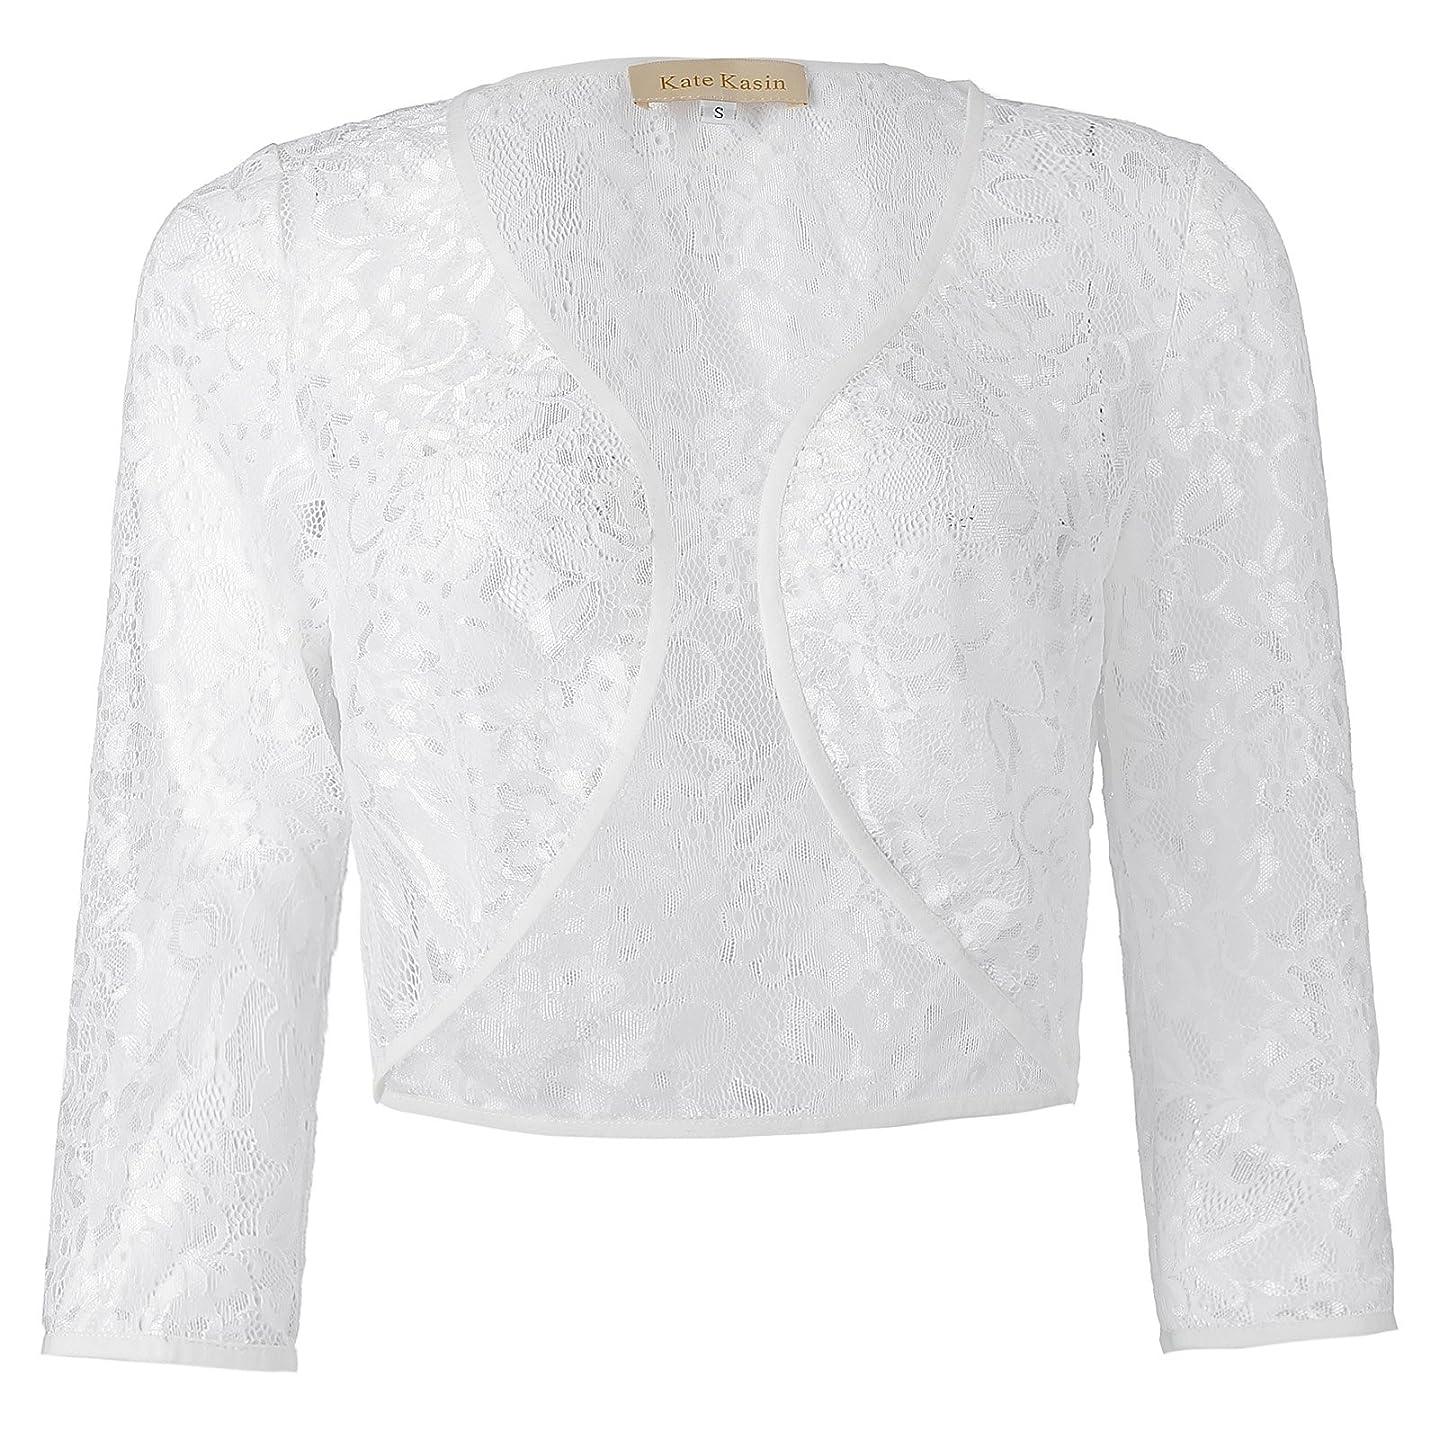 Kate Kasin Women's 3/4 Sleeve Lace Shrug Bolero Open Front Cardigan